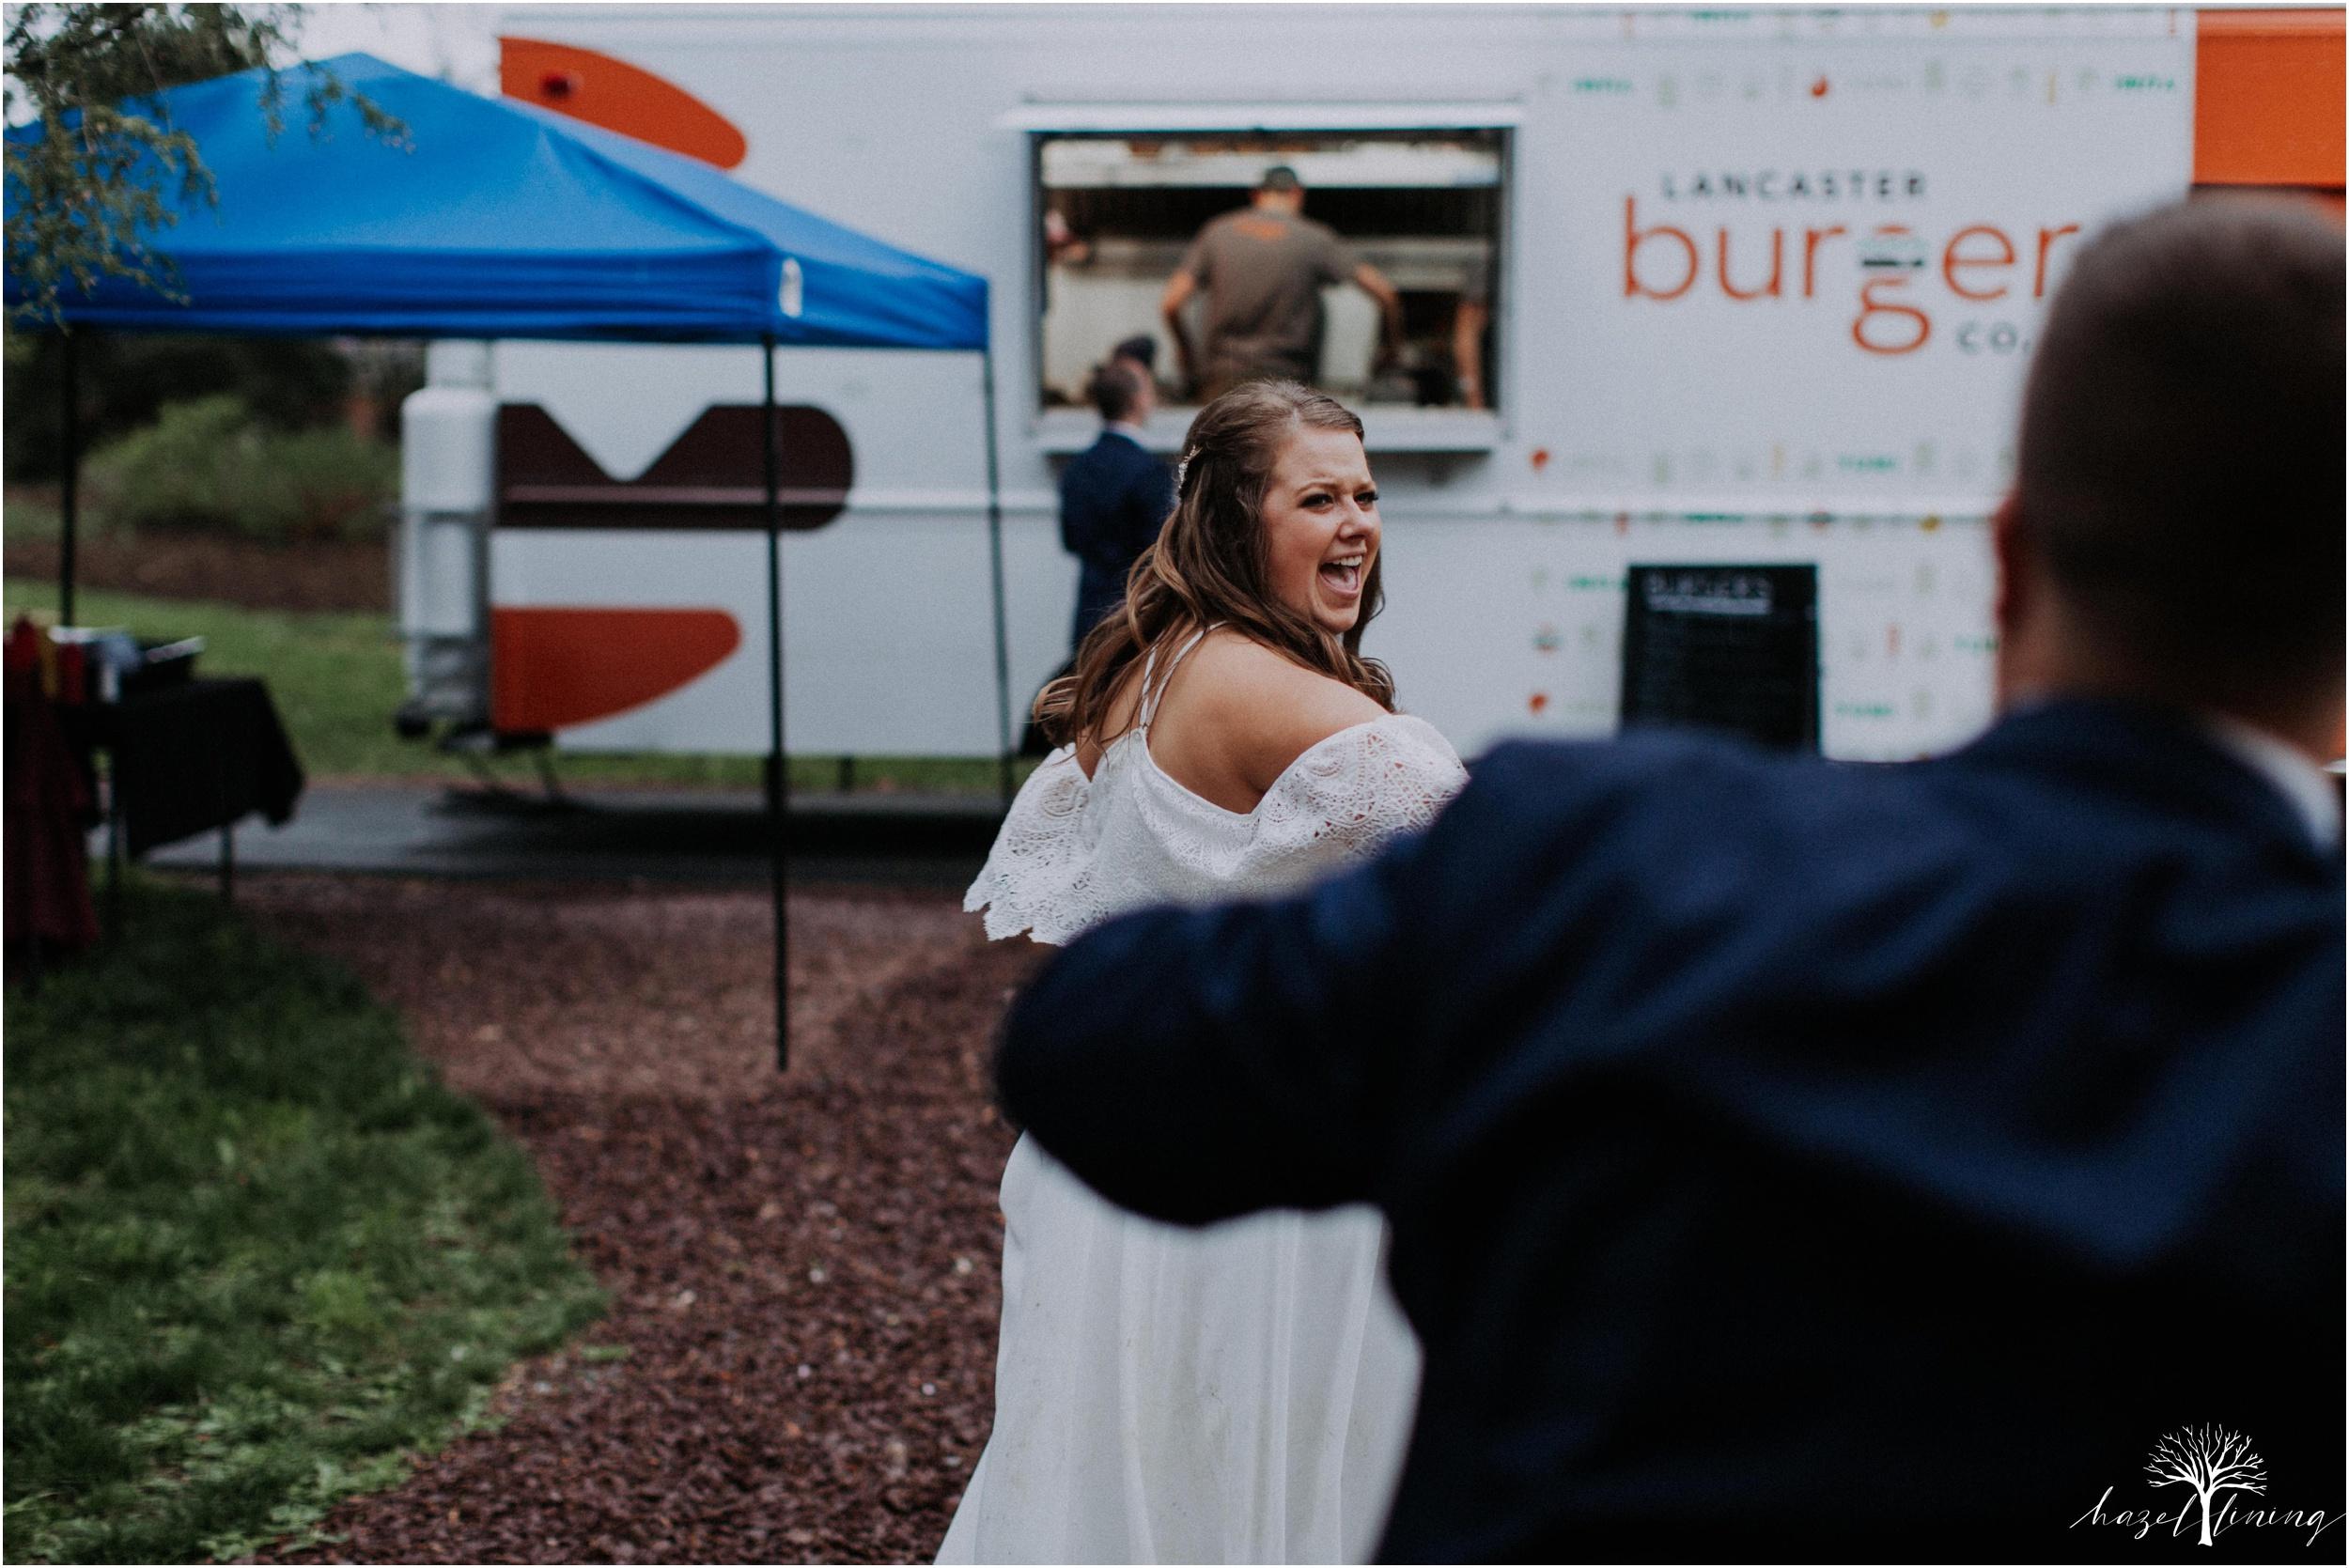 hazel-lining-travel-wedding-elopement-photography-abby-skyler-hunt-the-willis-house-york-pennsylvania-outdoor-estate-wedding_0135.jpg